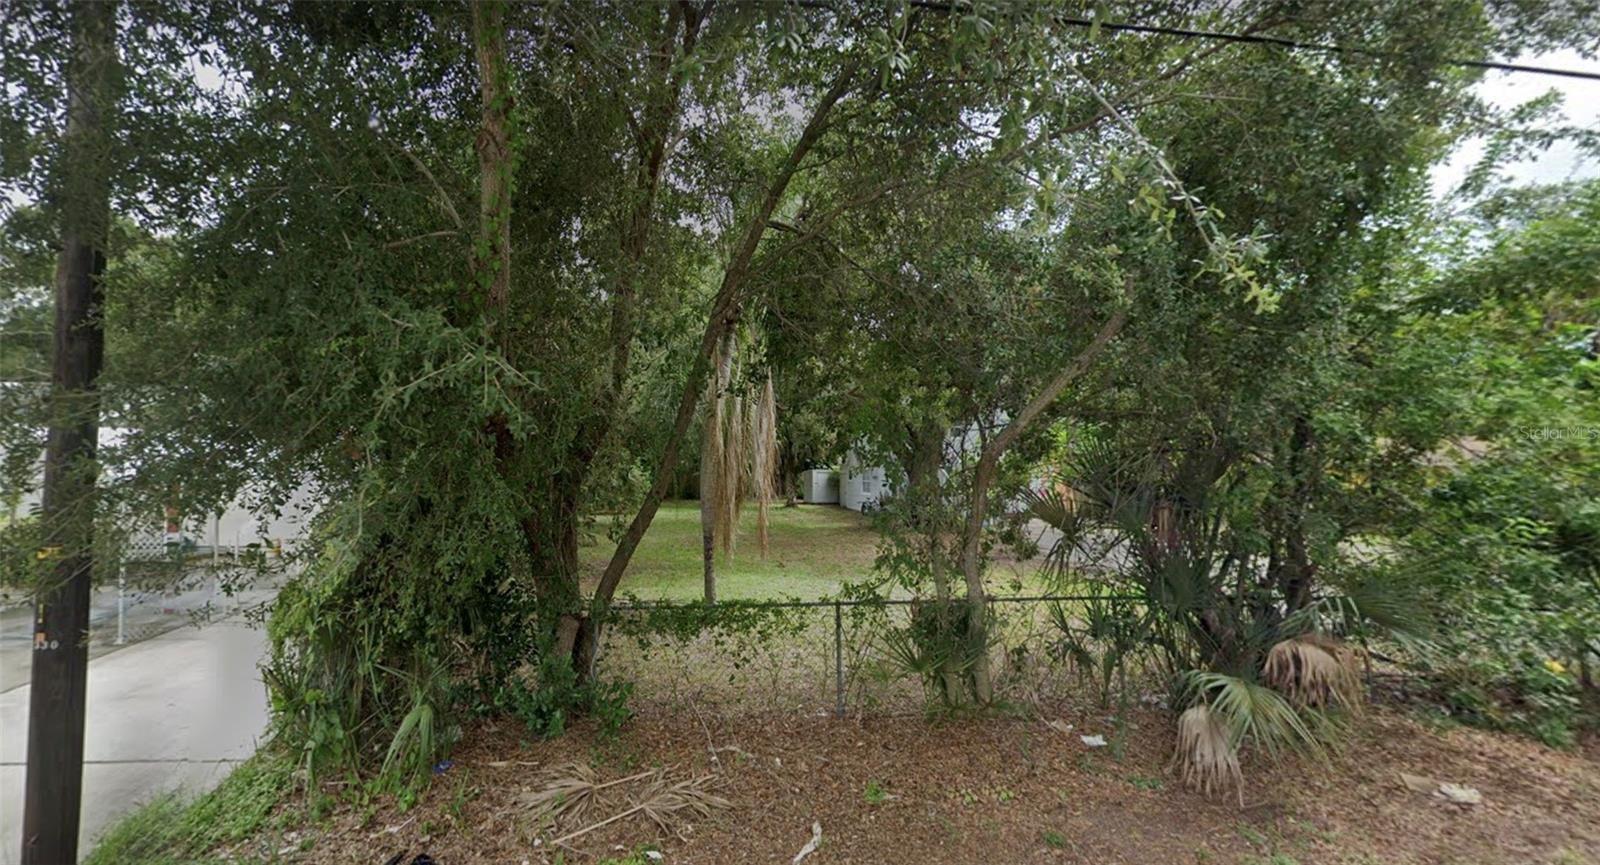 Photo of 2318 BAY STREET, SARASOTA, FL 34237 (MLS # A4505912)